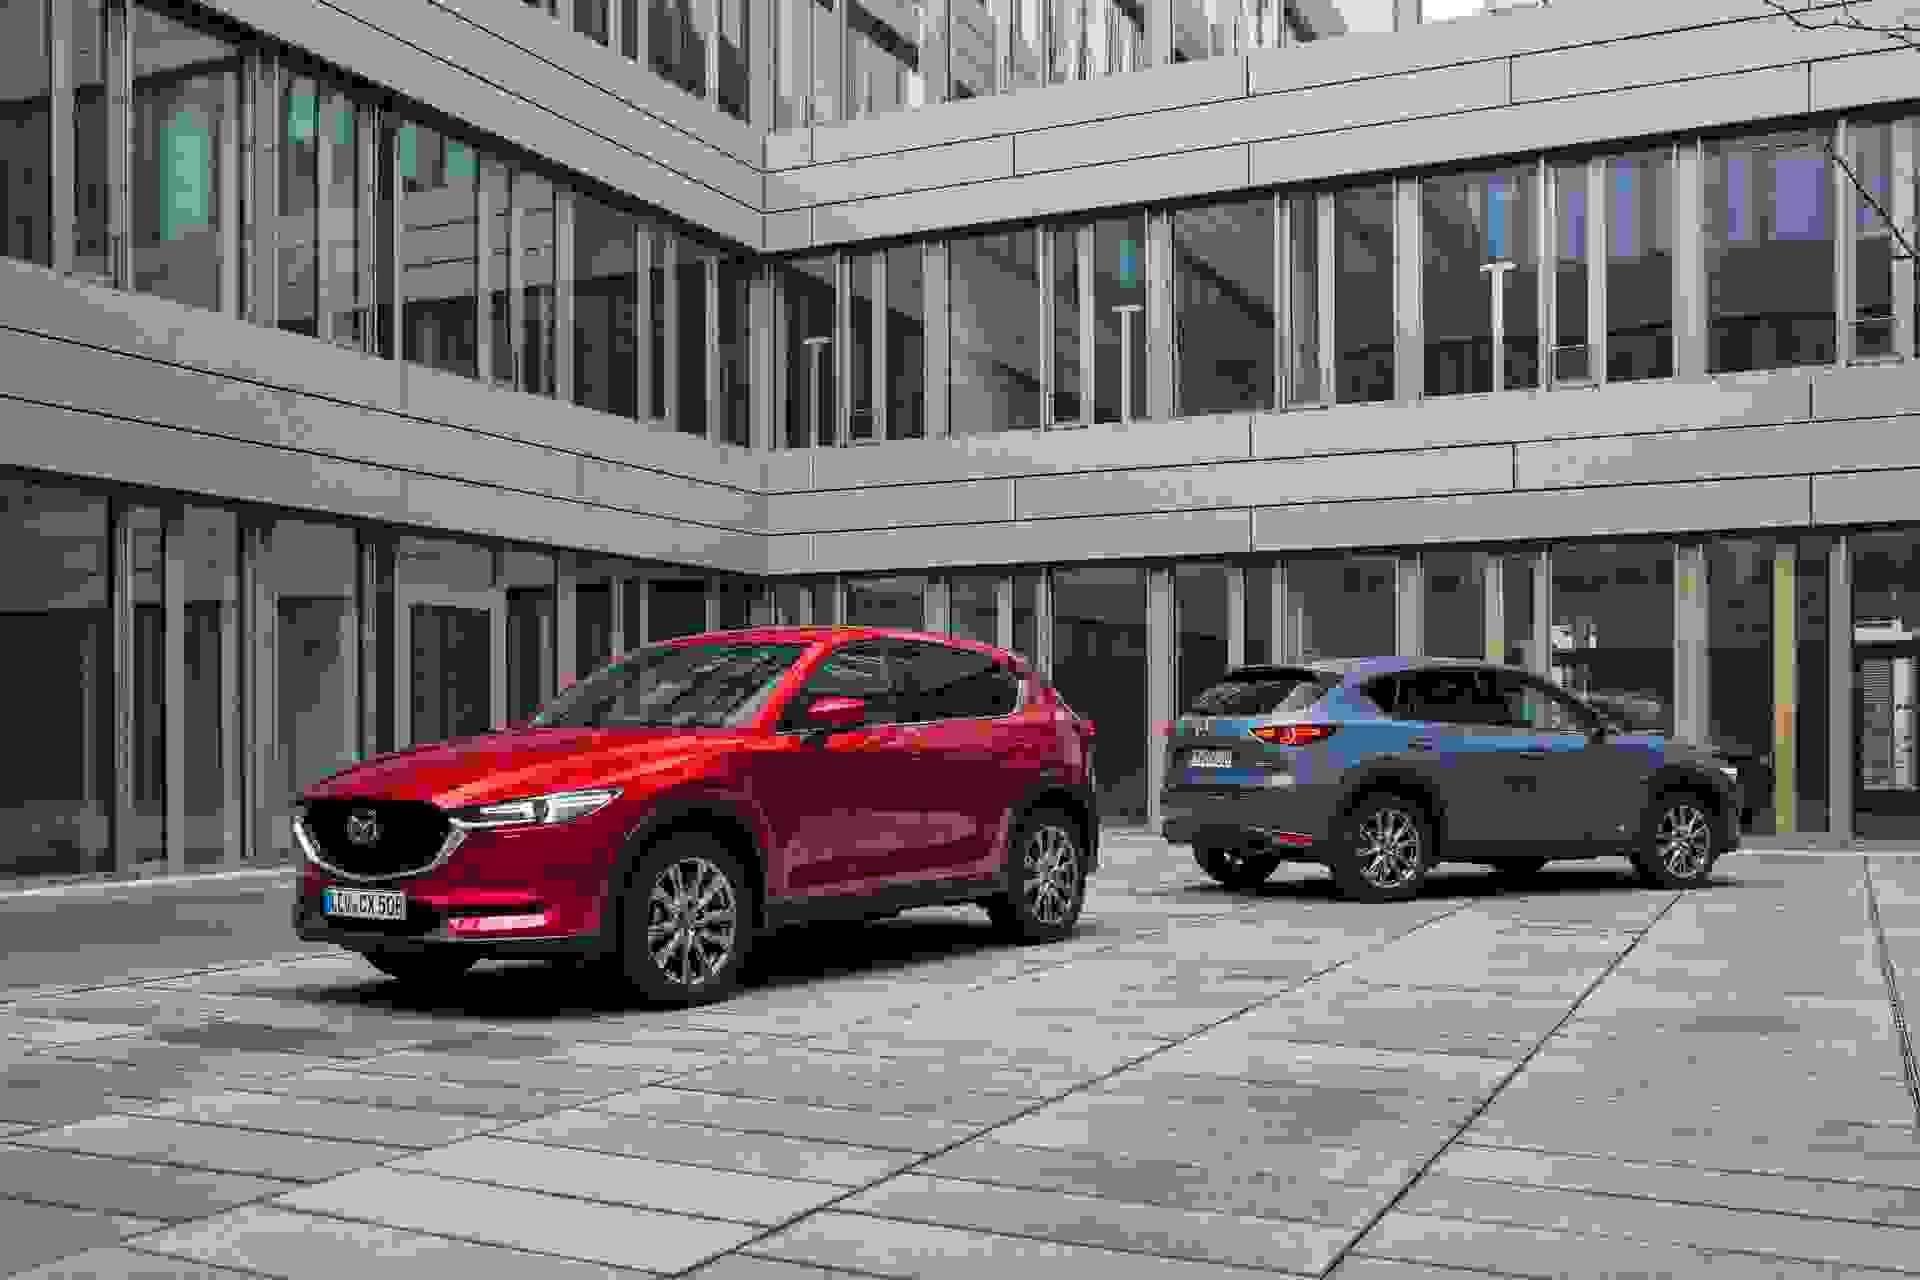 2021 Mazda CX 5 Germany Family Shot #1 Hires